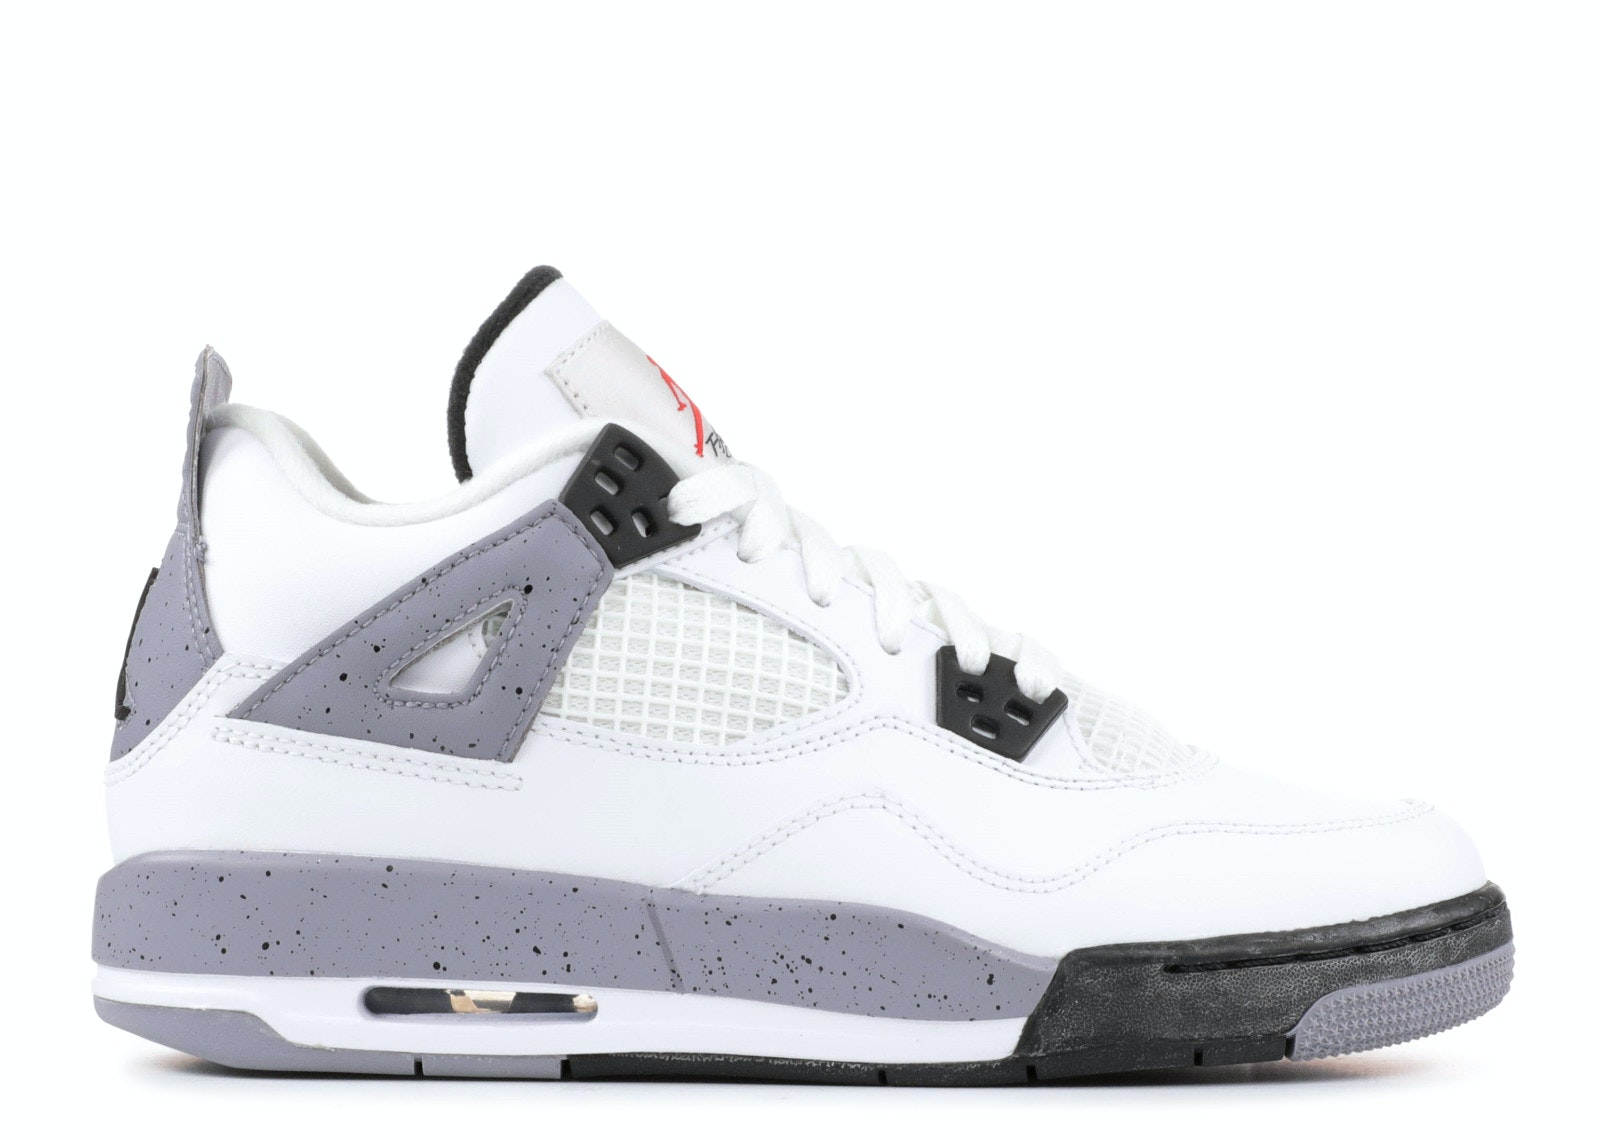 Jordan 4 Retro White Cement 2012 (GS)